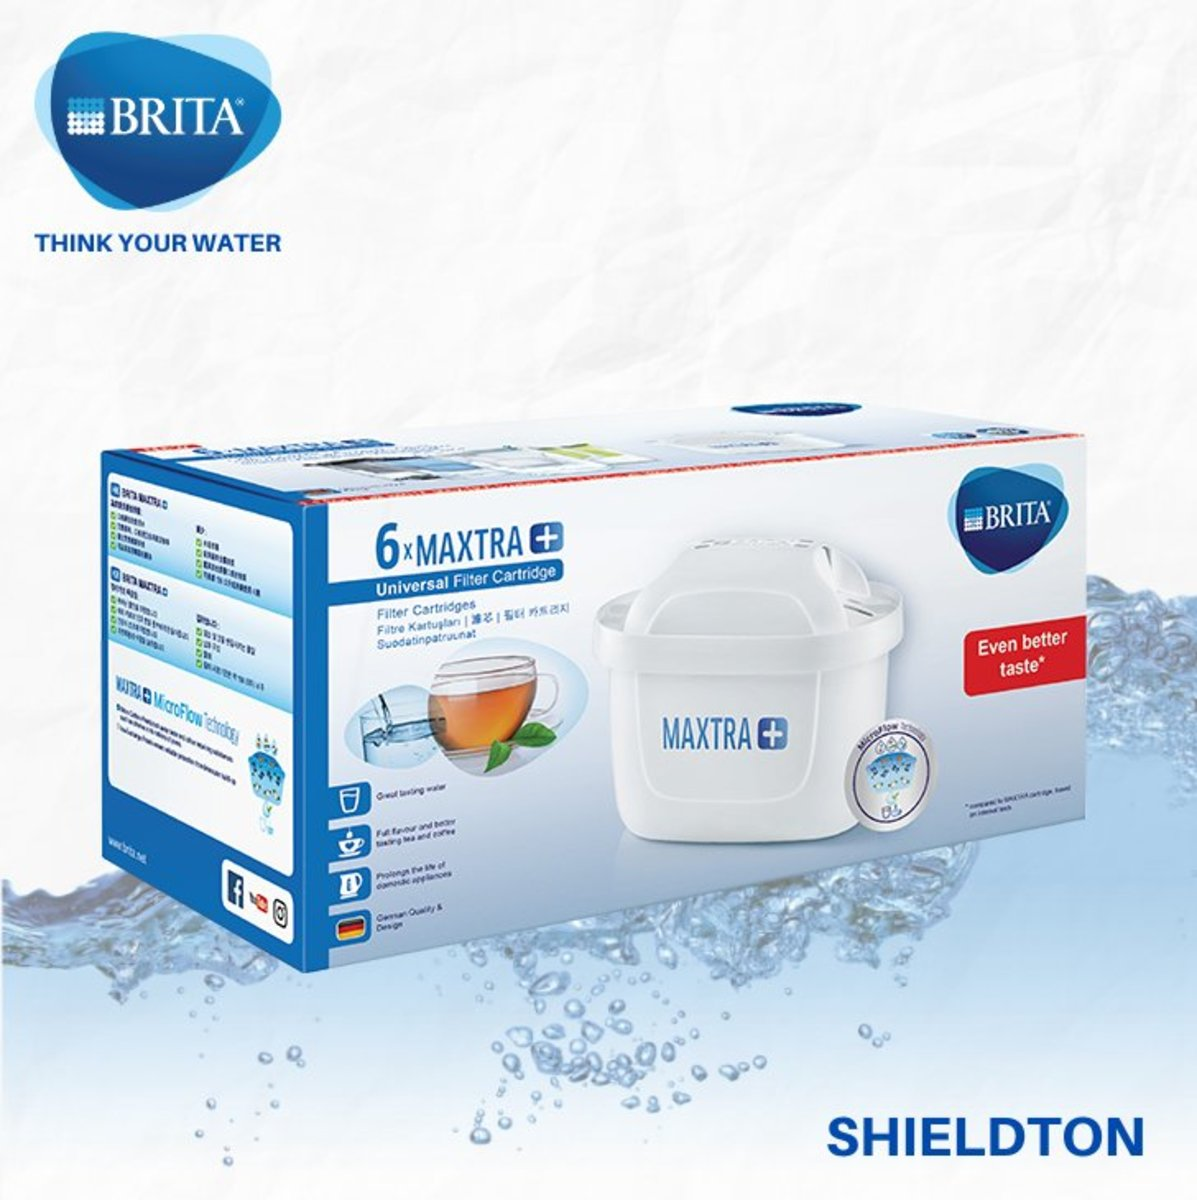 MAXTRA+ Universal 全效濾芯 (6件裝) - 白色